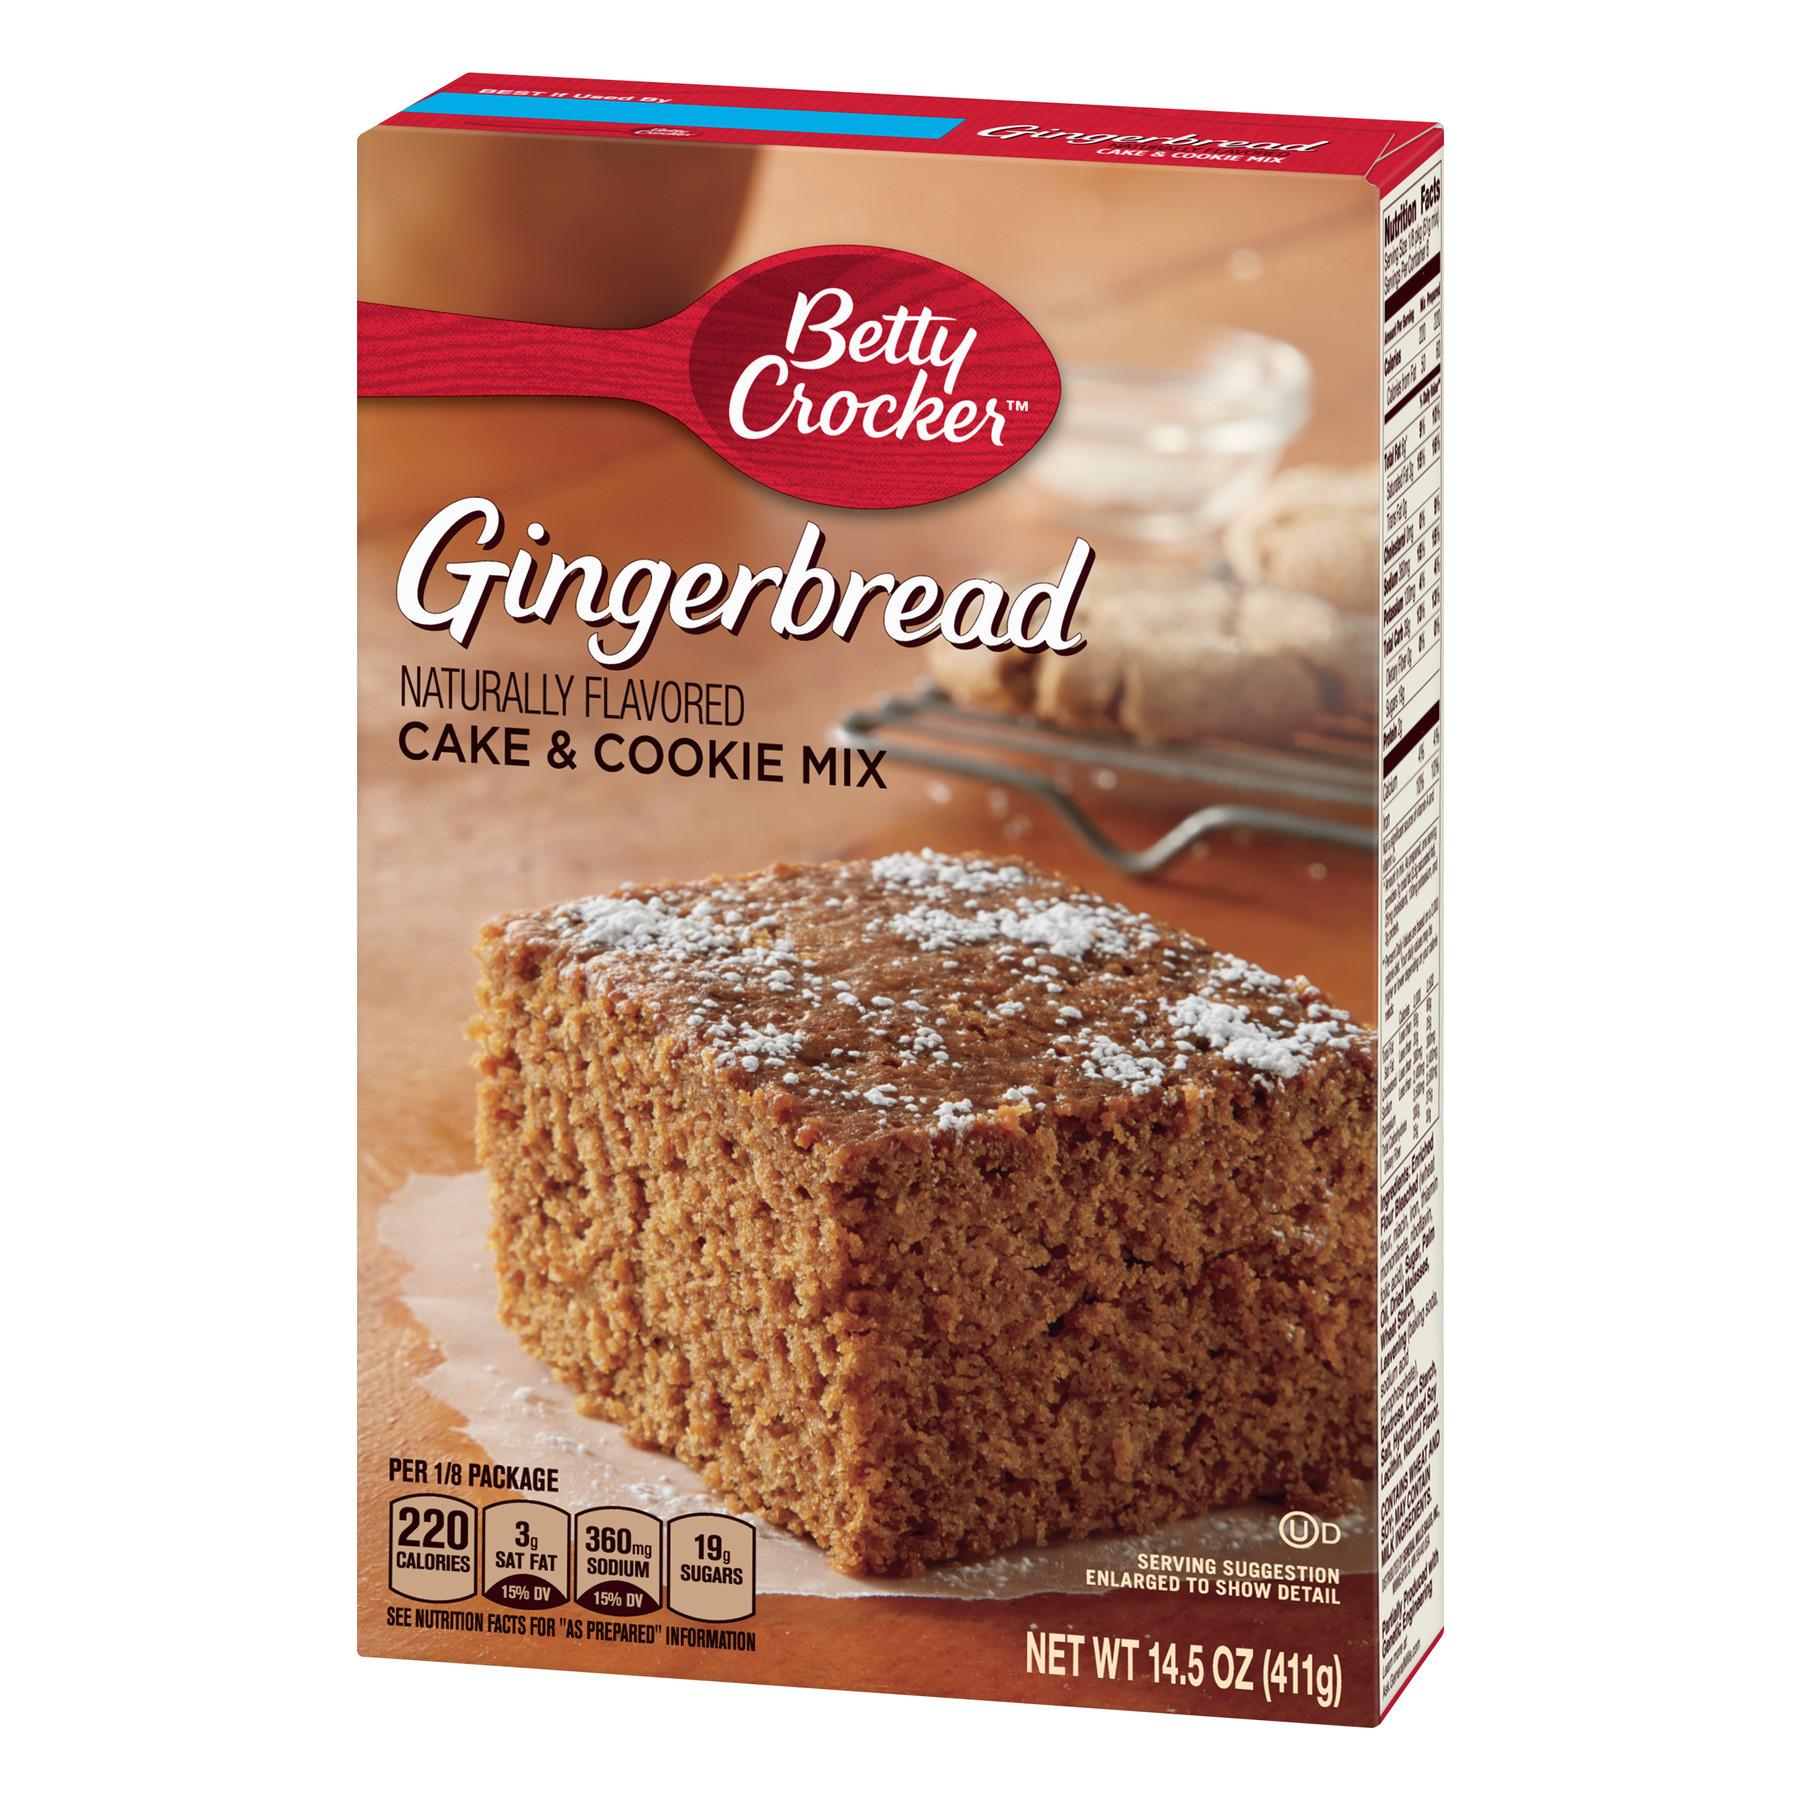 Honolulu Cookie Company Free Shipping Betty Crocker Gingerbread Cake and Cookie Mix 14 5 Oz Walmart Com